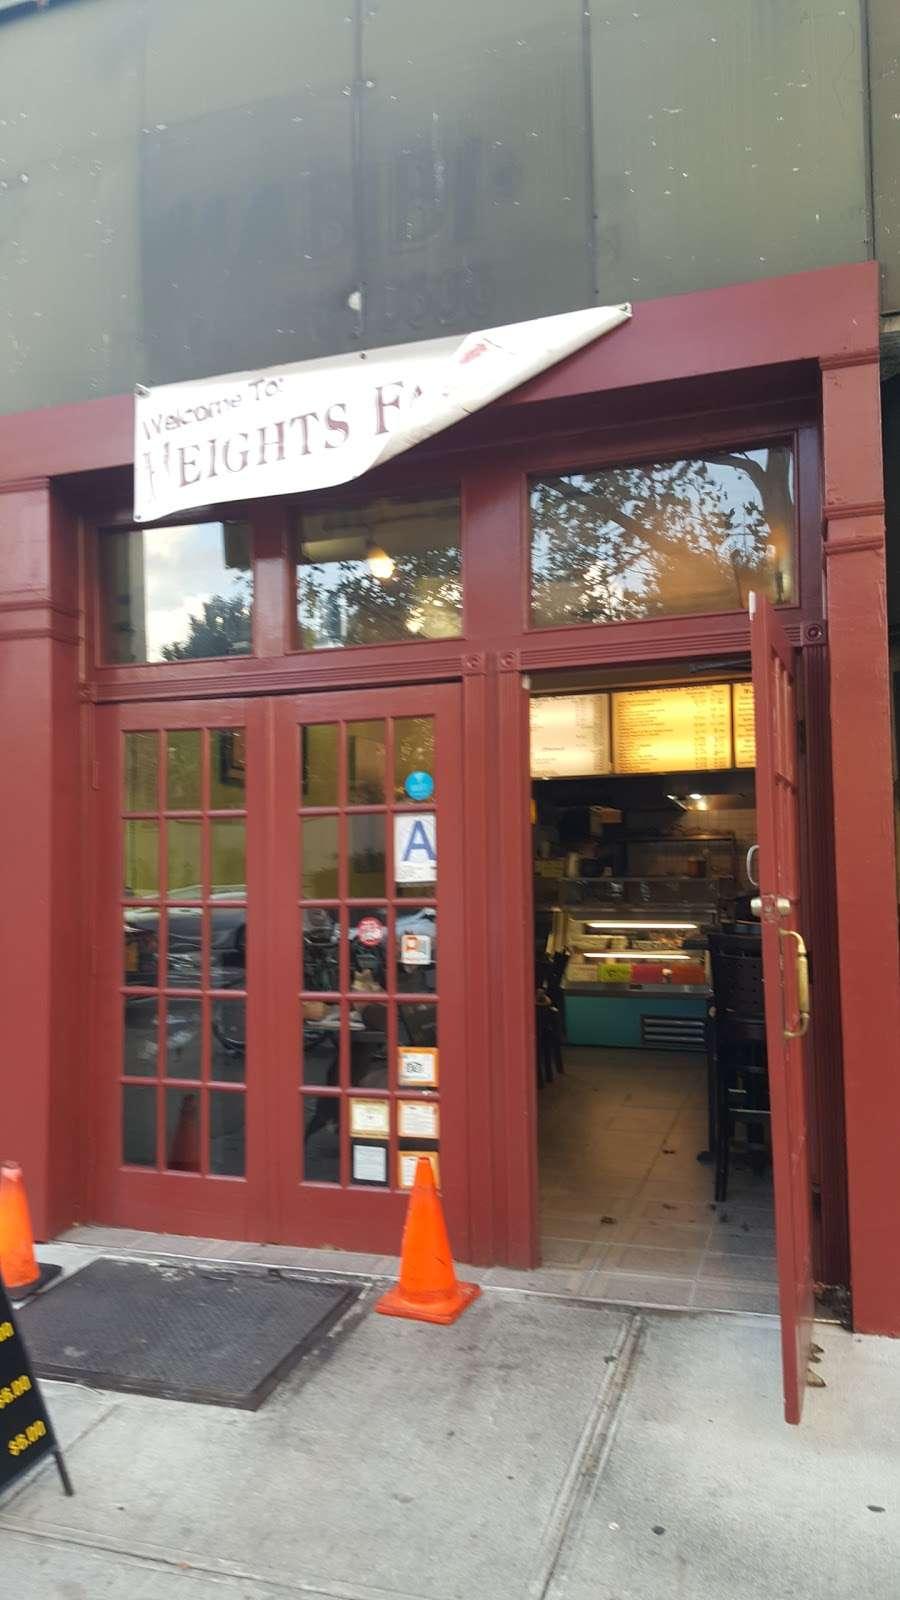 Heights Falafel - restaurant  | Photo 3 of 10 | Address: 78 Henry St, Brooklyn, NY 11201, USA | Phone: (718) 488-0808